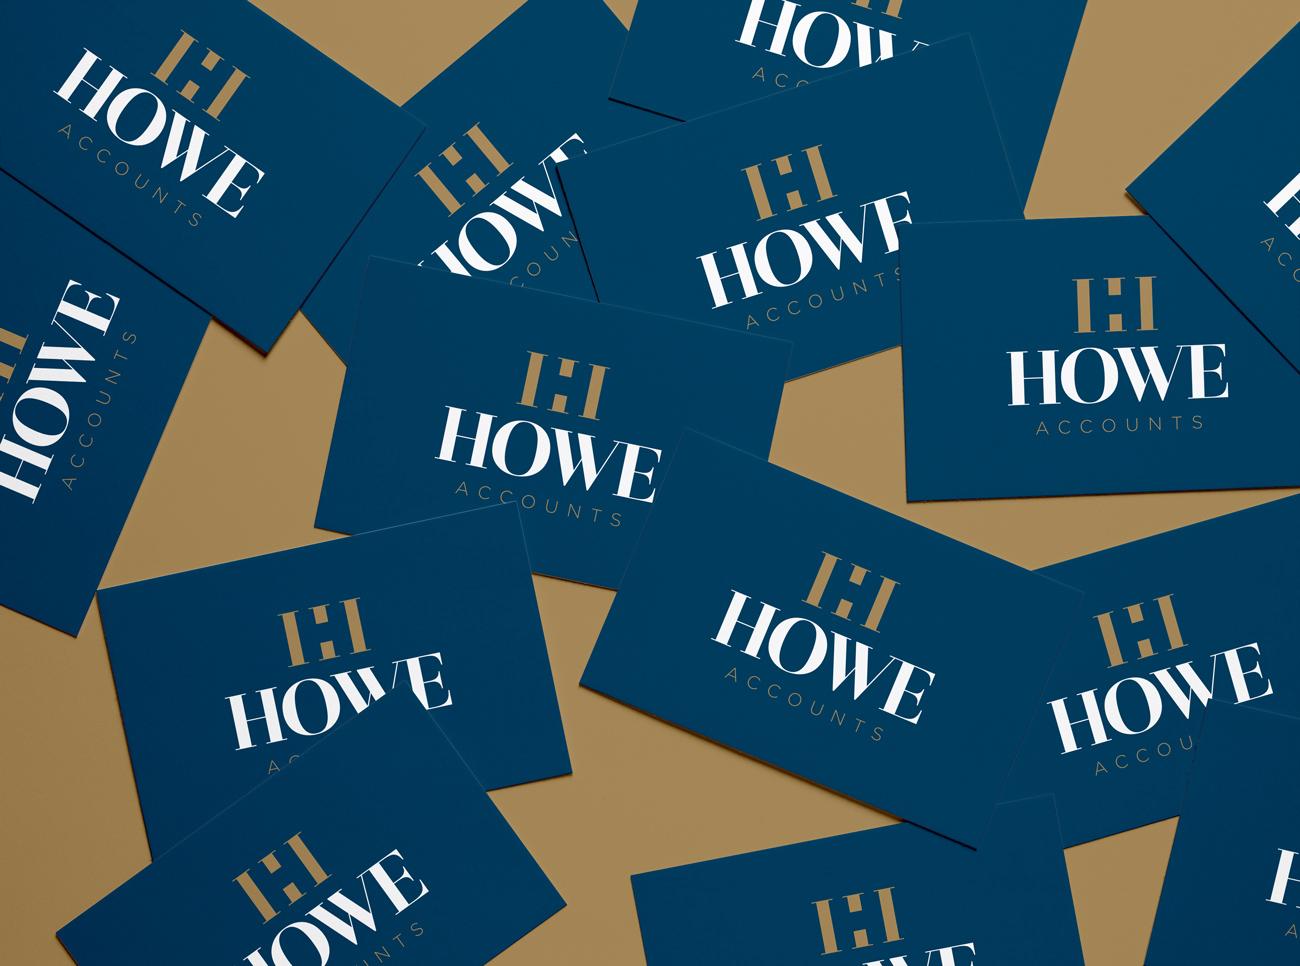 Howe Accounts Business Card Design Birmingham